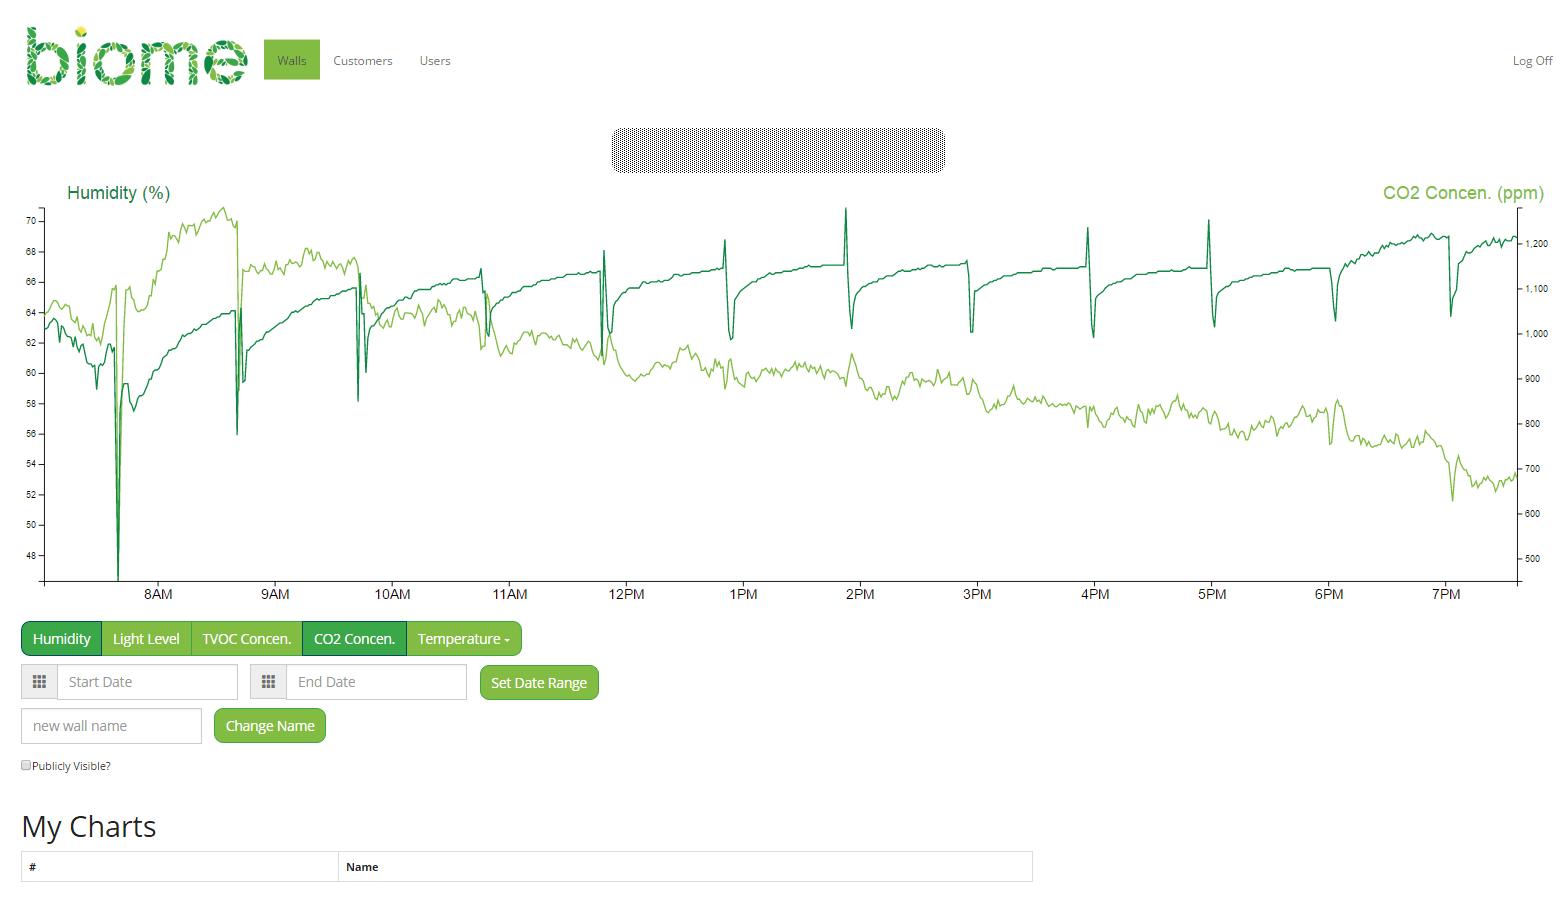 Wall Chart Display